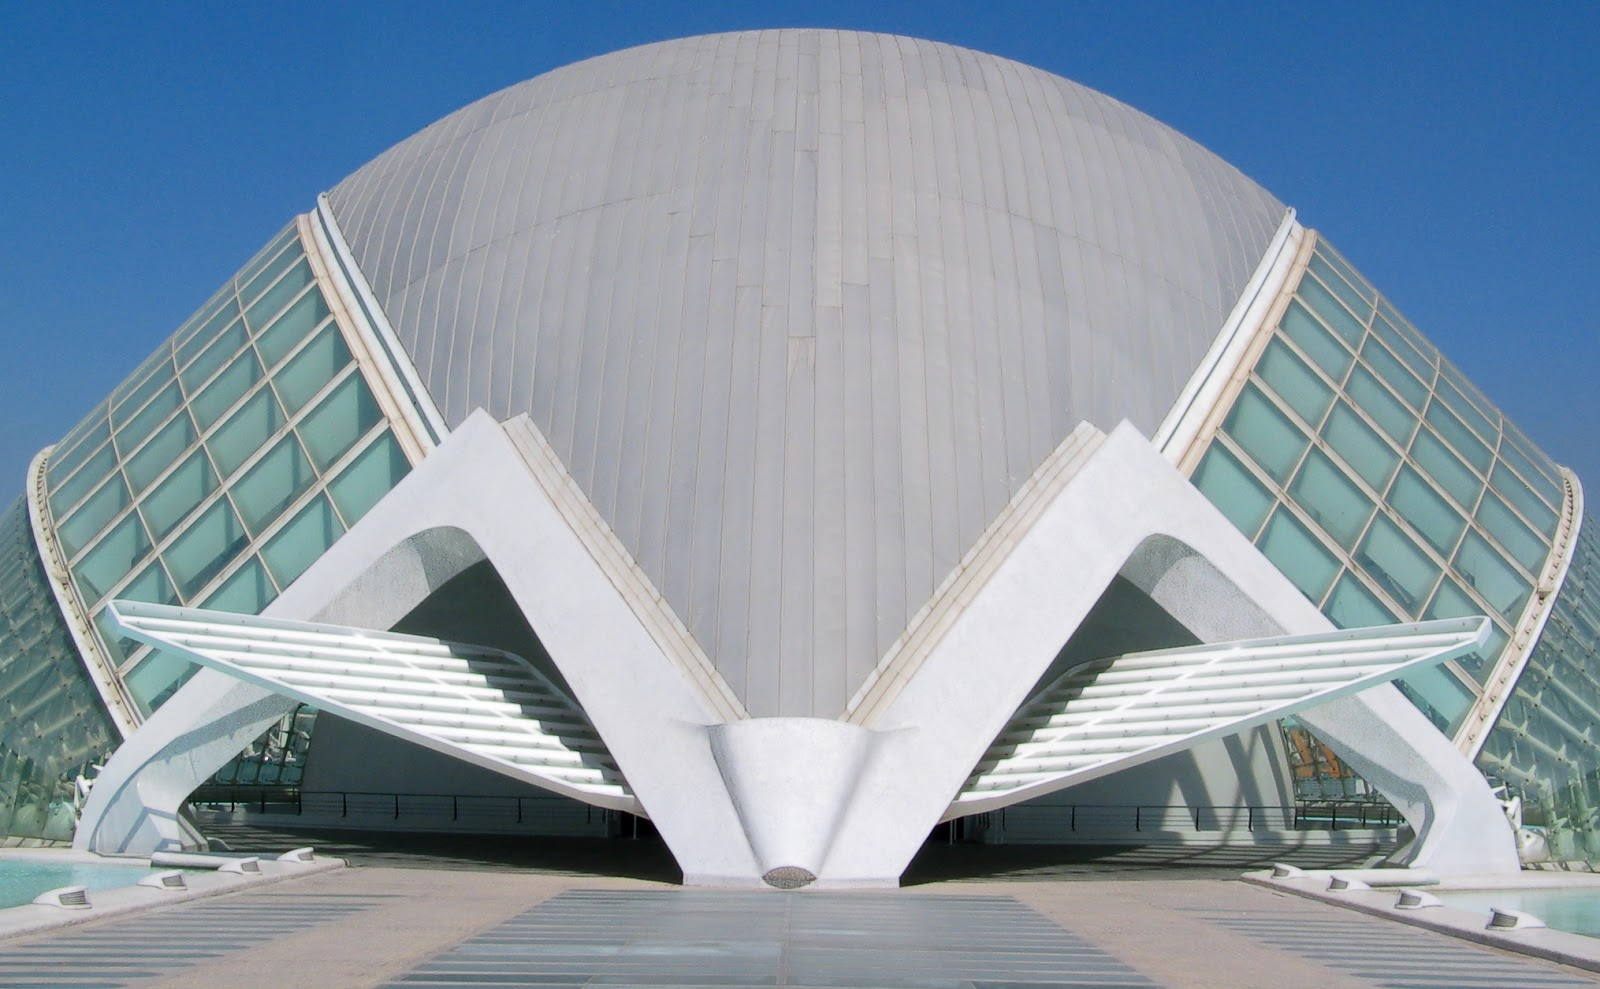 #31659A Inova Vidros: Vidro & Arquitetura Obras Incríveis 1580 Vidros Janelas Fortaleza